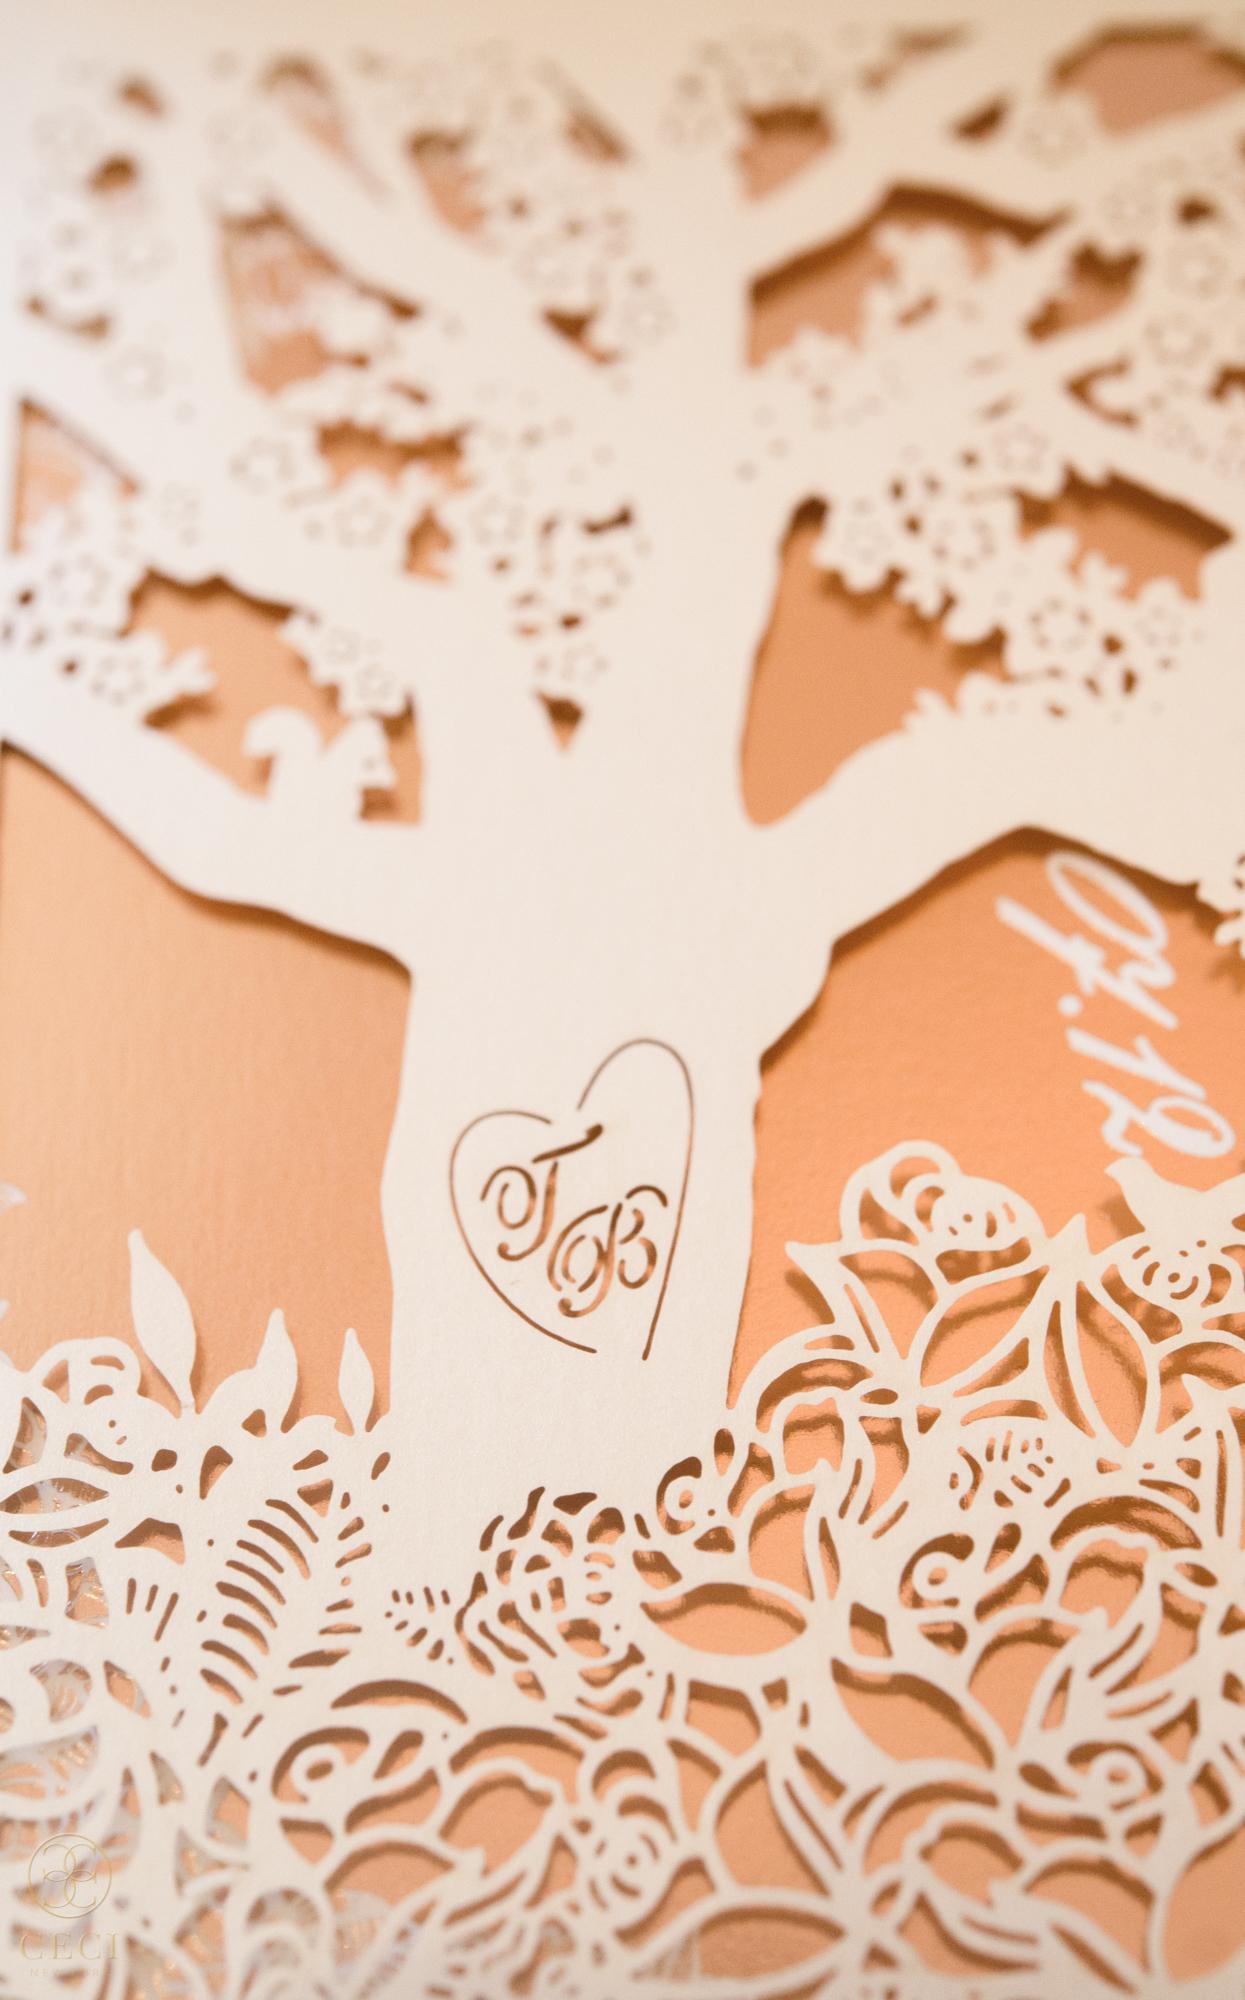 rose_gold_pink_romantic_real_wedding_roses_inspiration_cecinewyork_cecistyle_v152_1-5.jpg